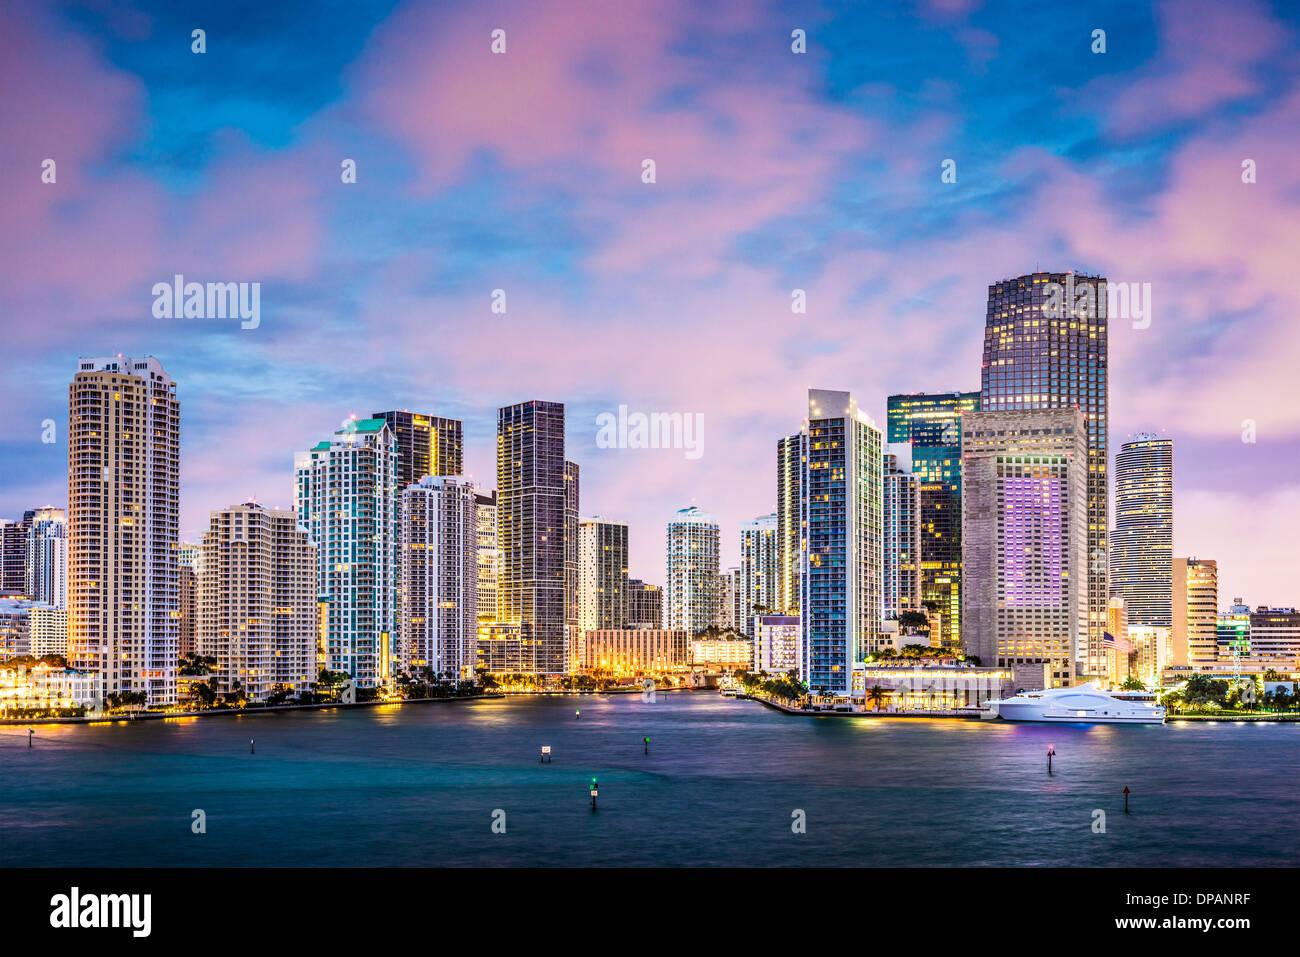 Skyline of Miami, Florida, USA at Brickell Key and Miami River. - Stock Image